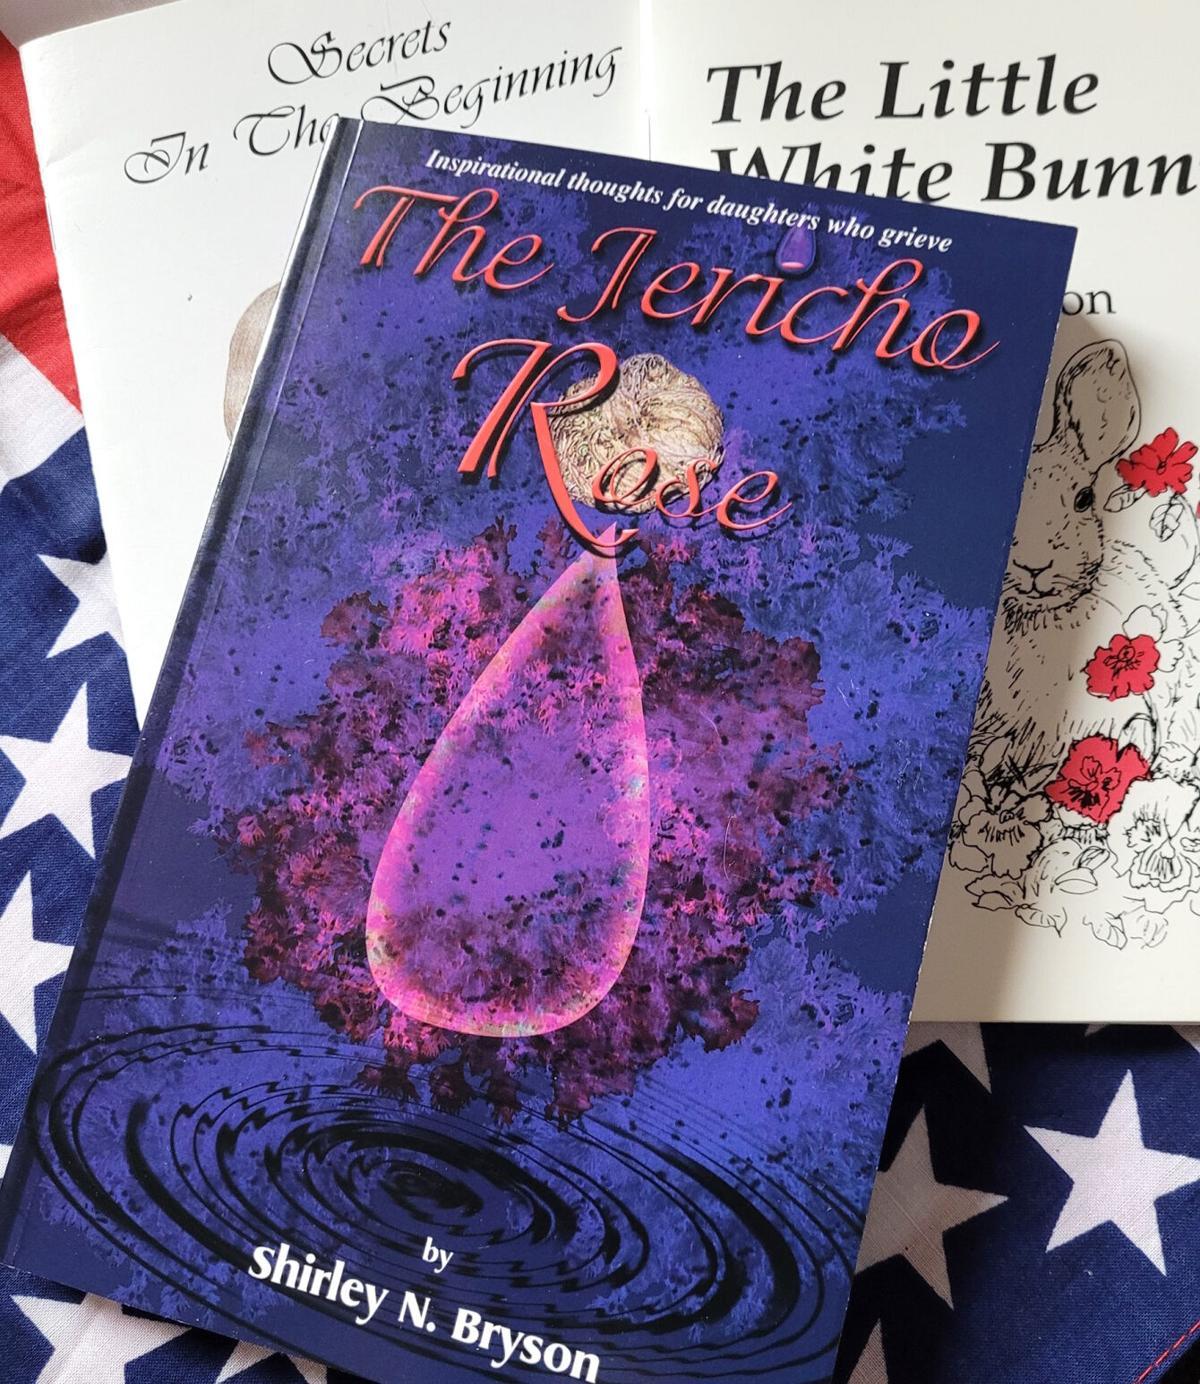 DeKalb County native relaunches books